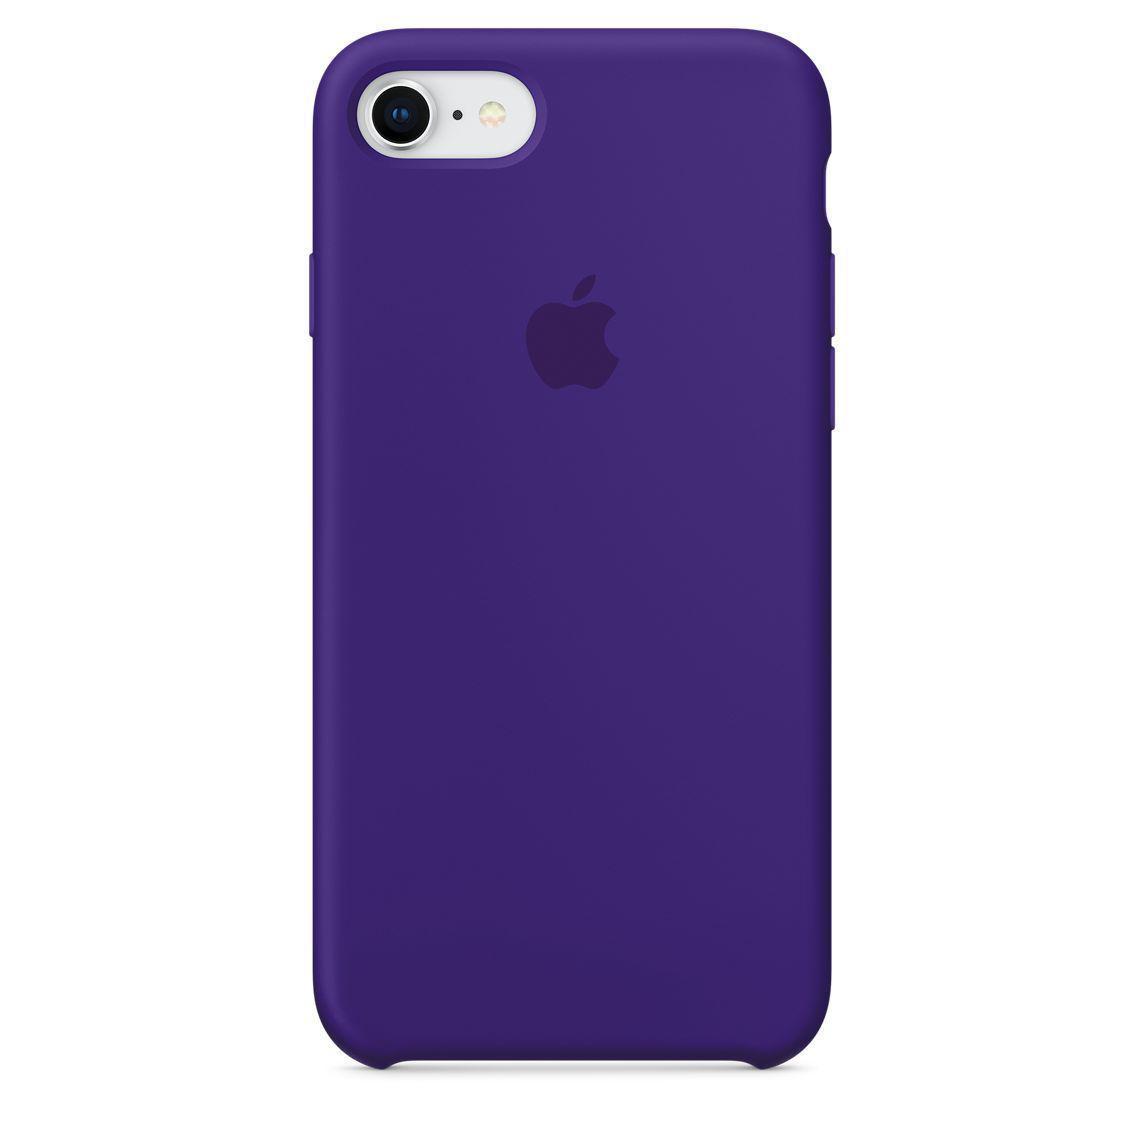 Чехол накладка Silicone Case для iPhone 5/5s/se - Ultra Violet